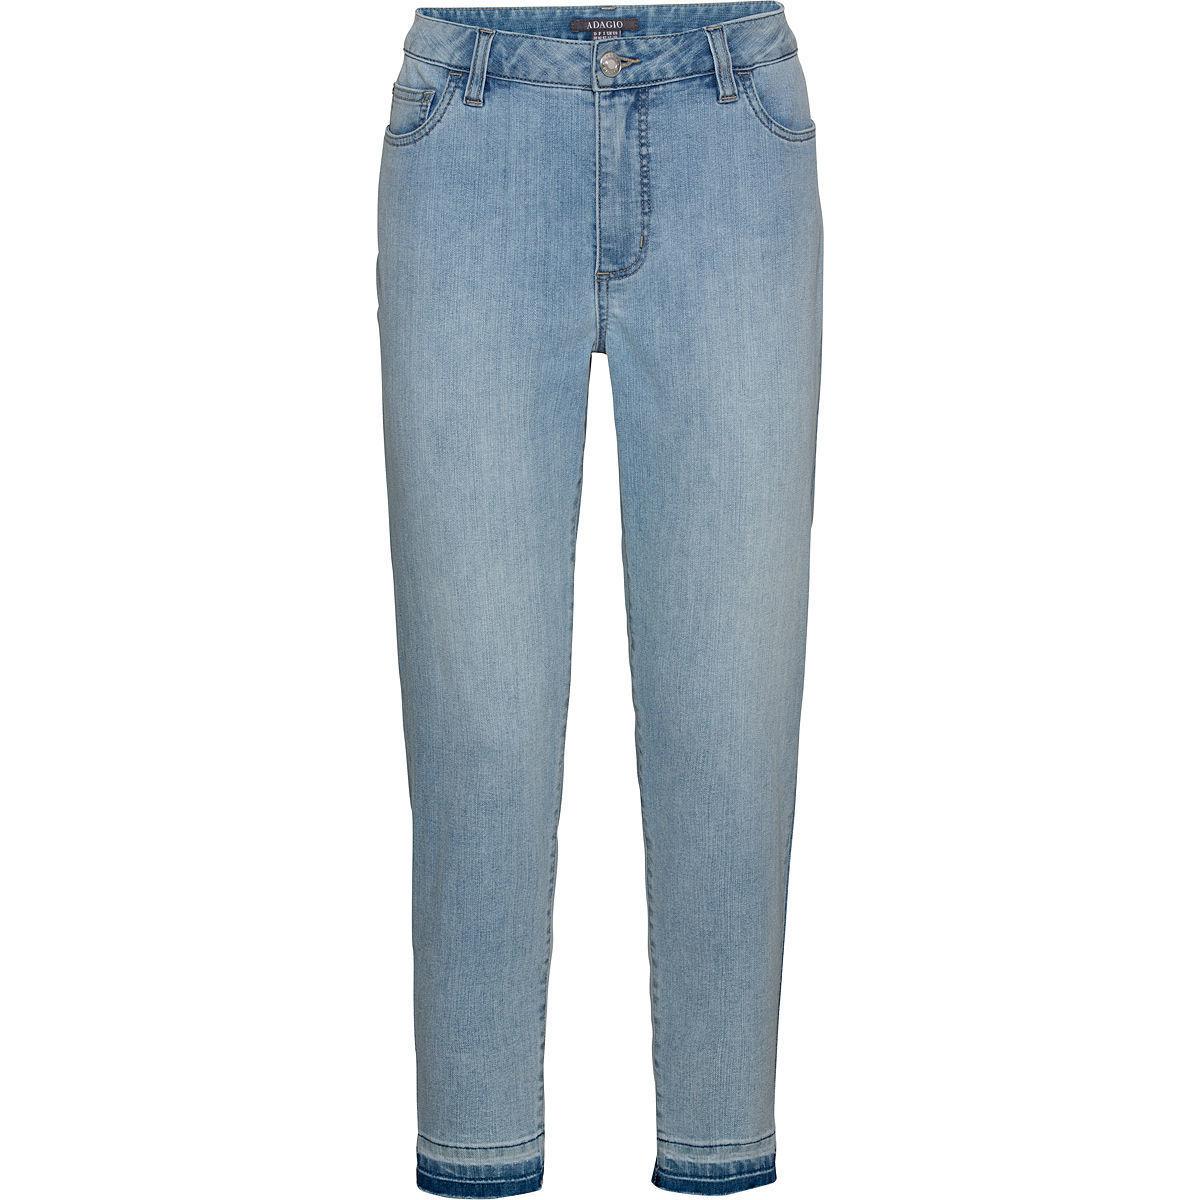 Bild 1 von Adagio Damen 7/8 Skinny-Jeans